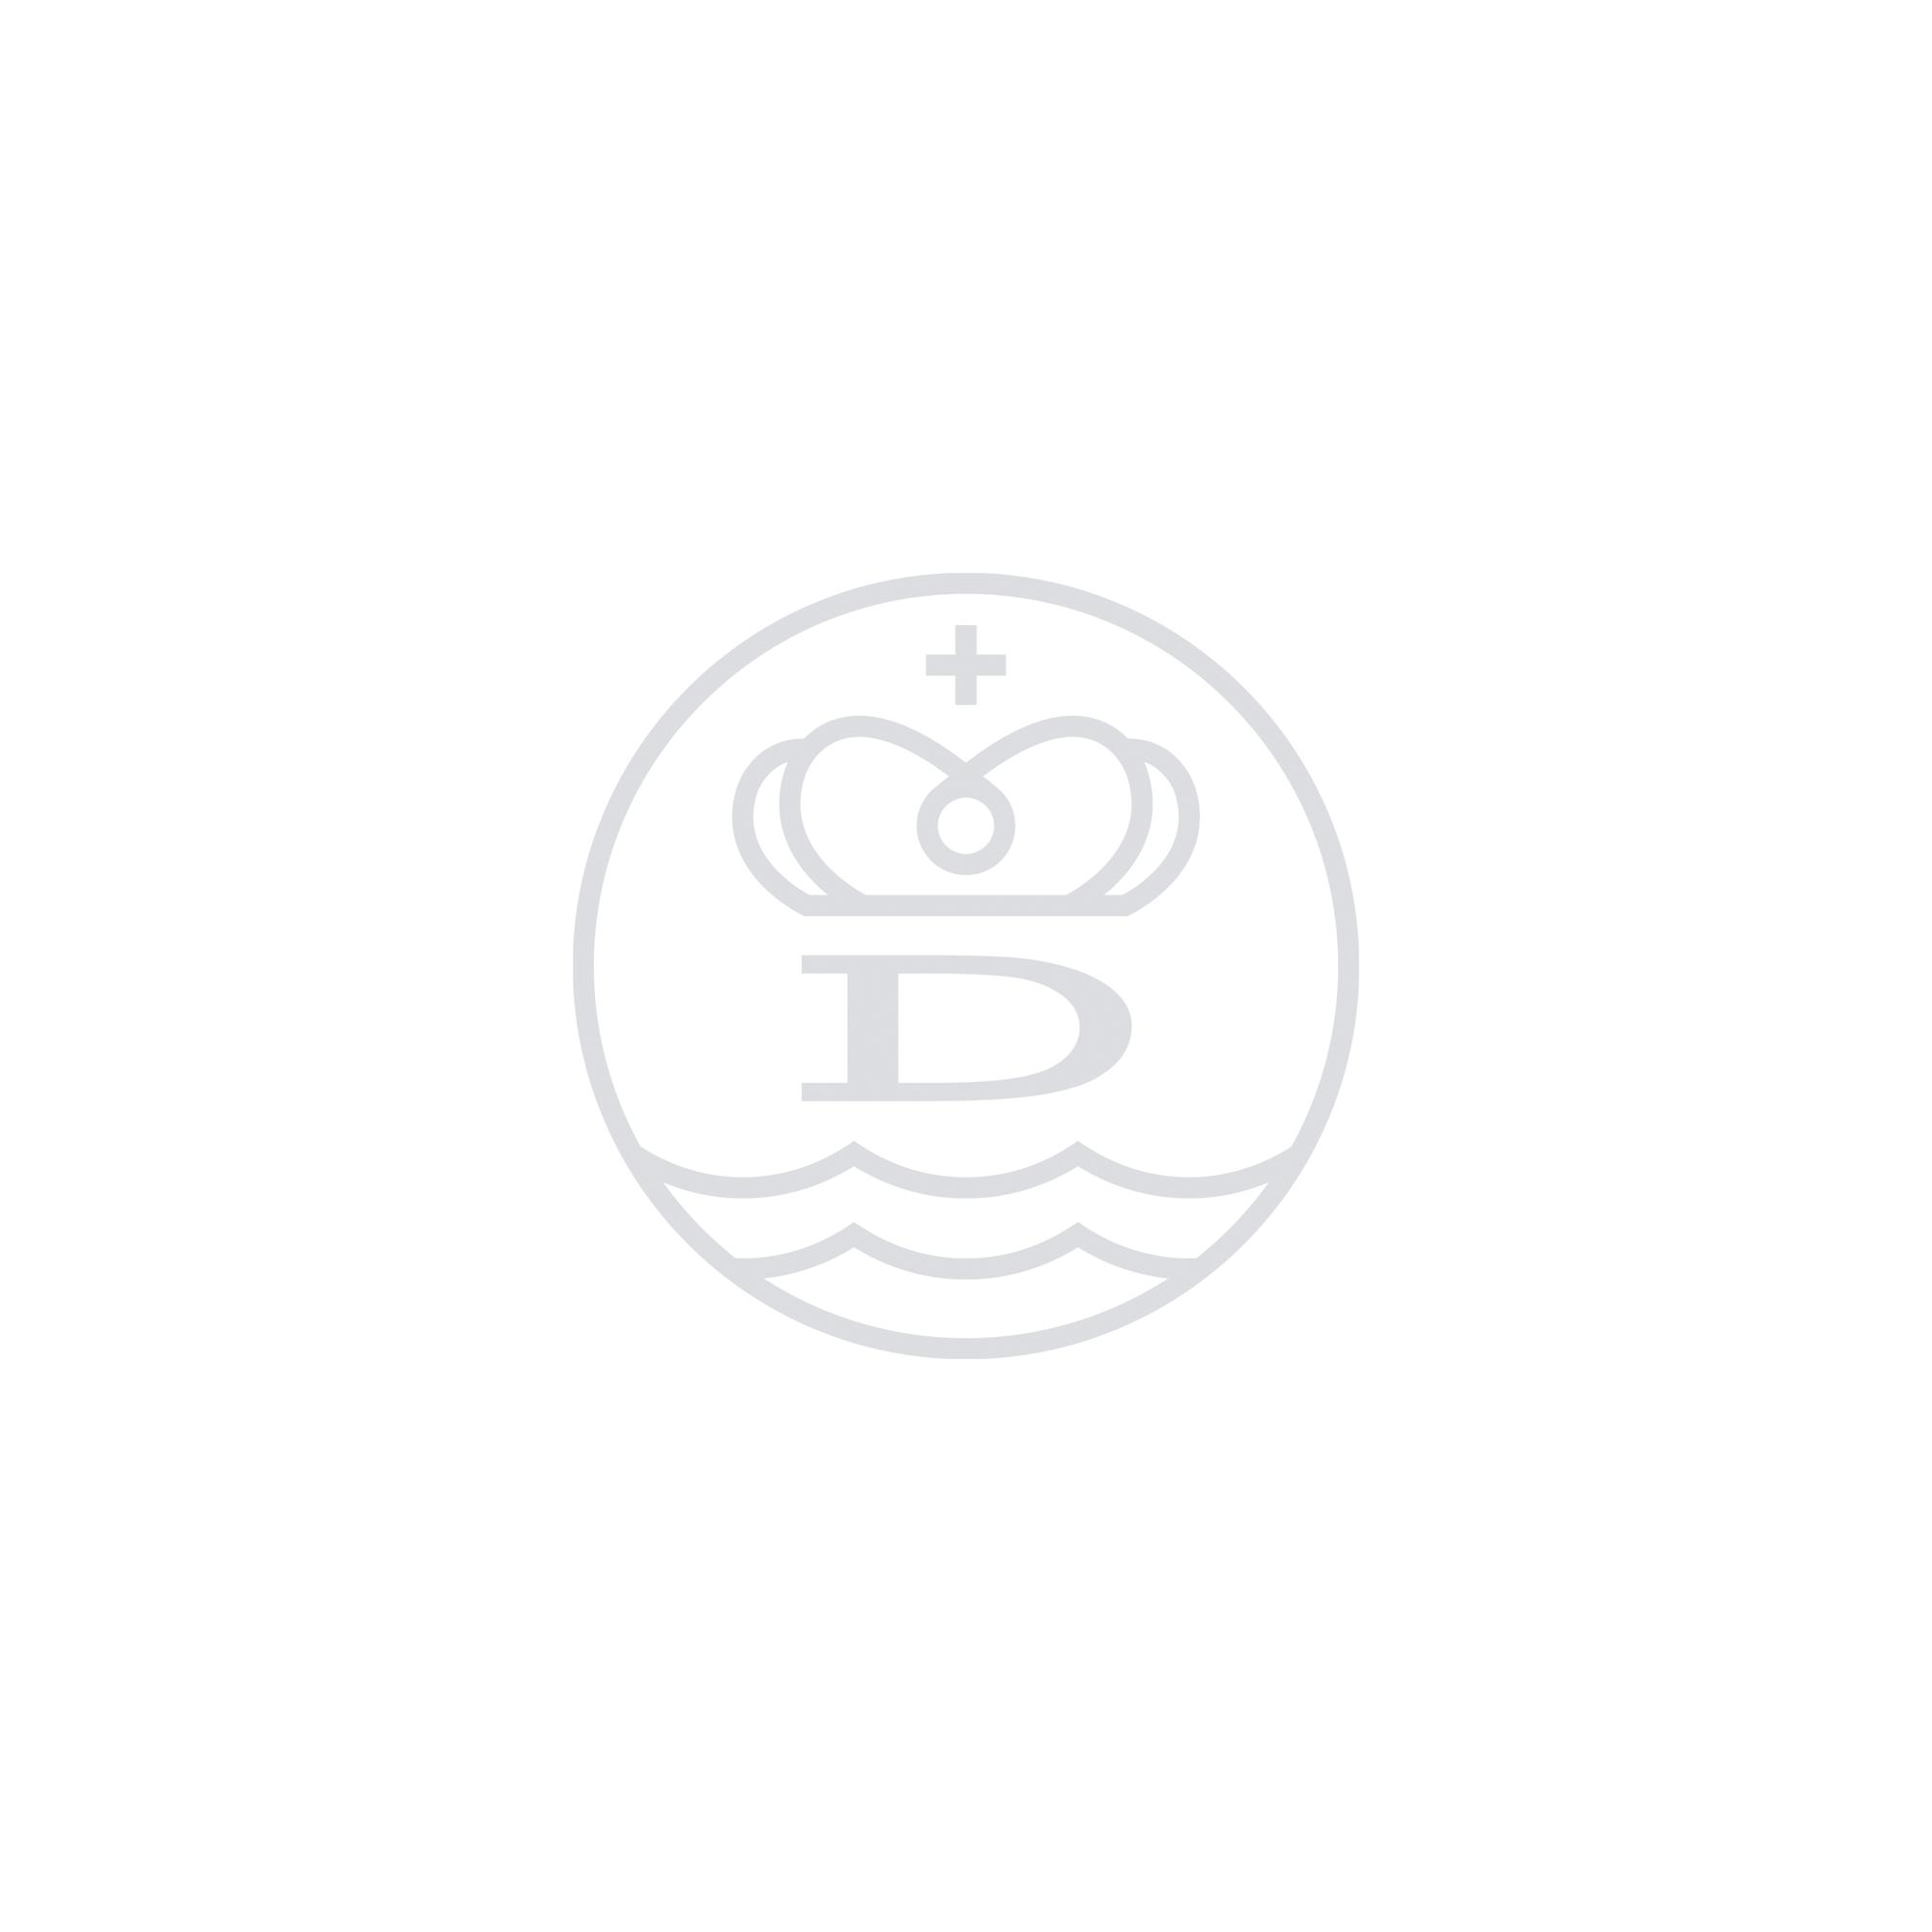 DENALI White Gold Emerald & Diamond Claw Ring detailed